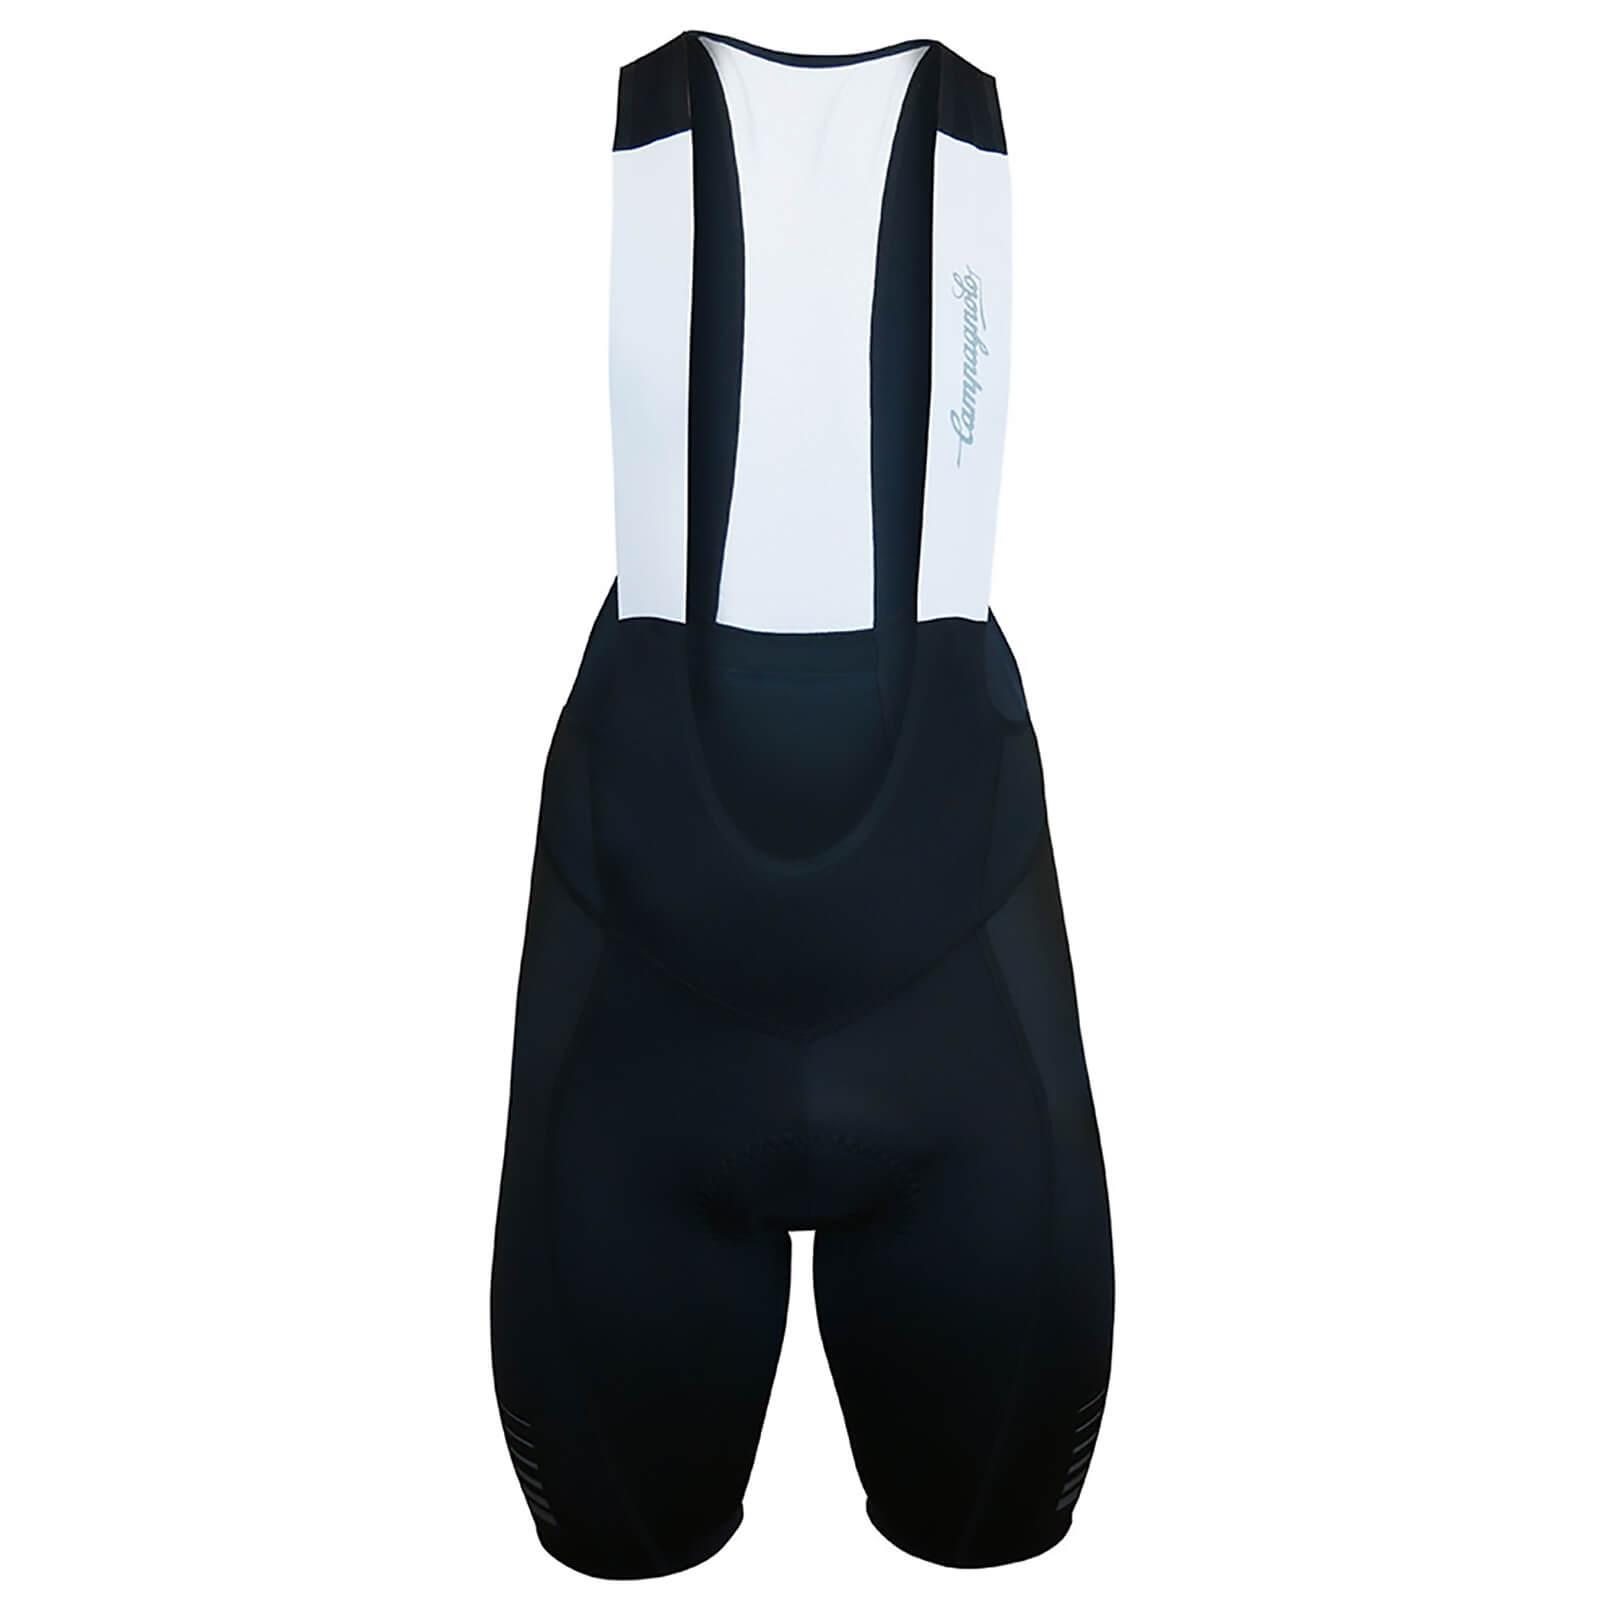 Nalini Campagnolo Magnesio Bib Shorts - M